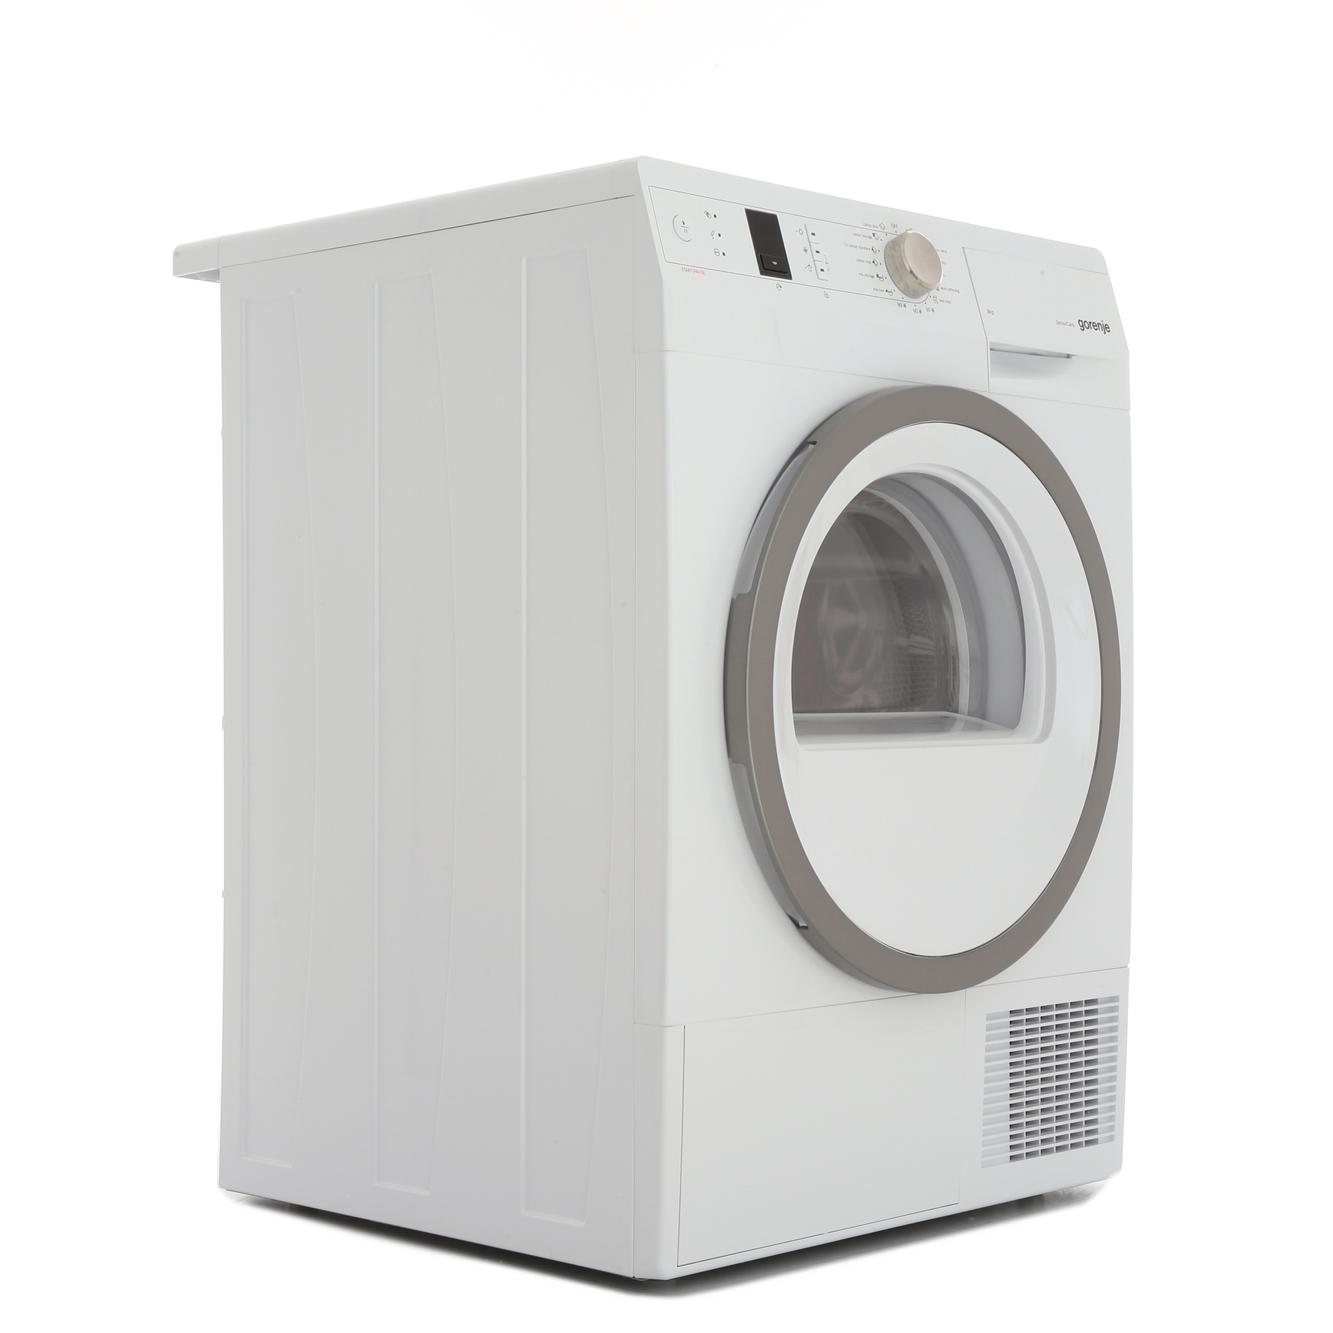 Gorenje D95F65NUK Condenser Dryer with Heat Pump Technology